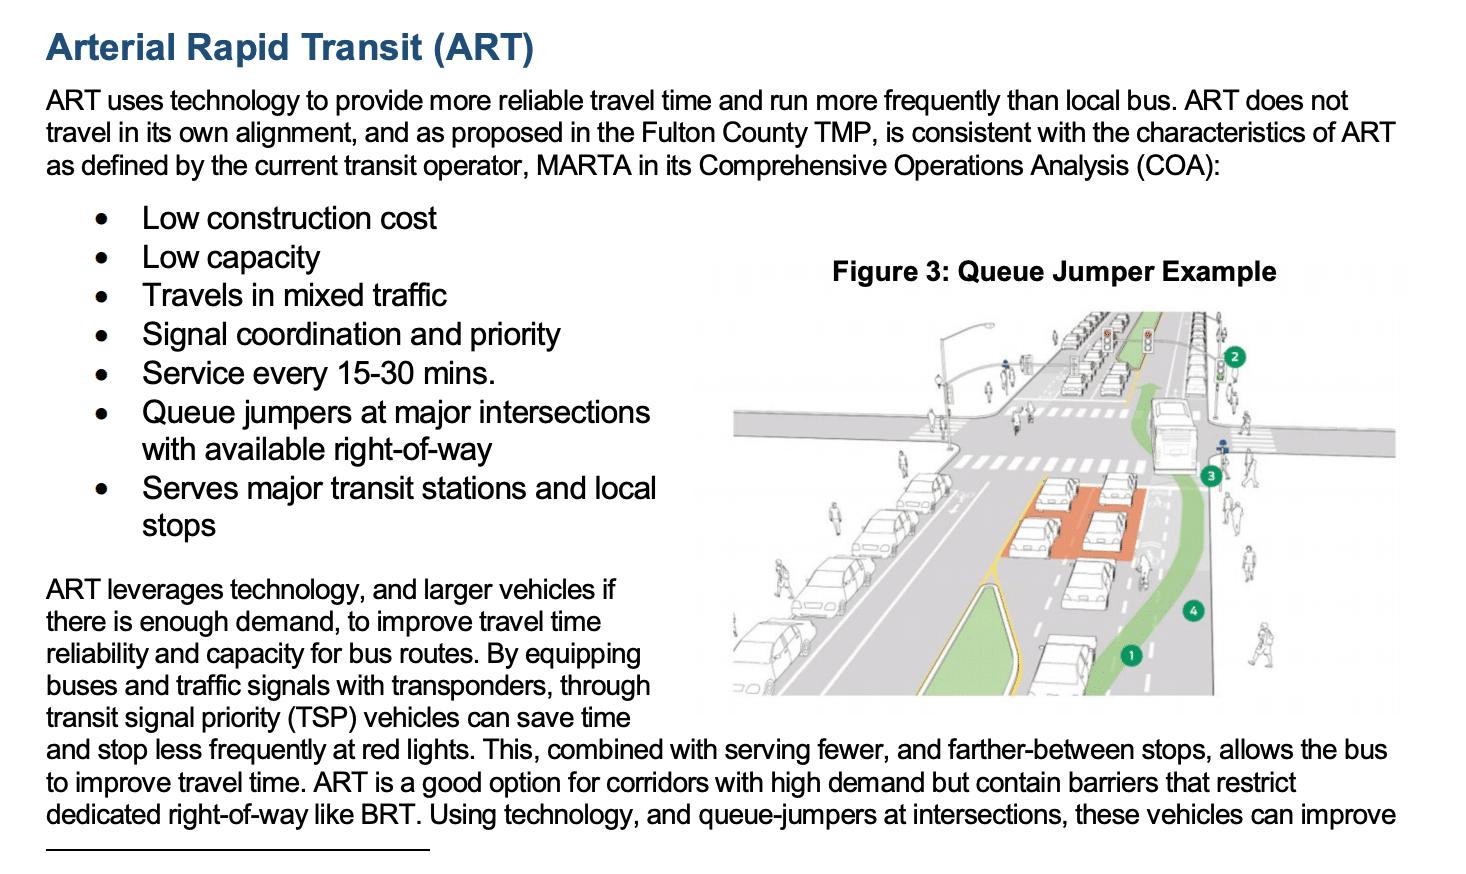 Arterial Rapid Transit for Johns Creek